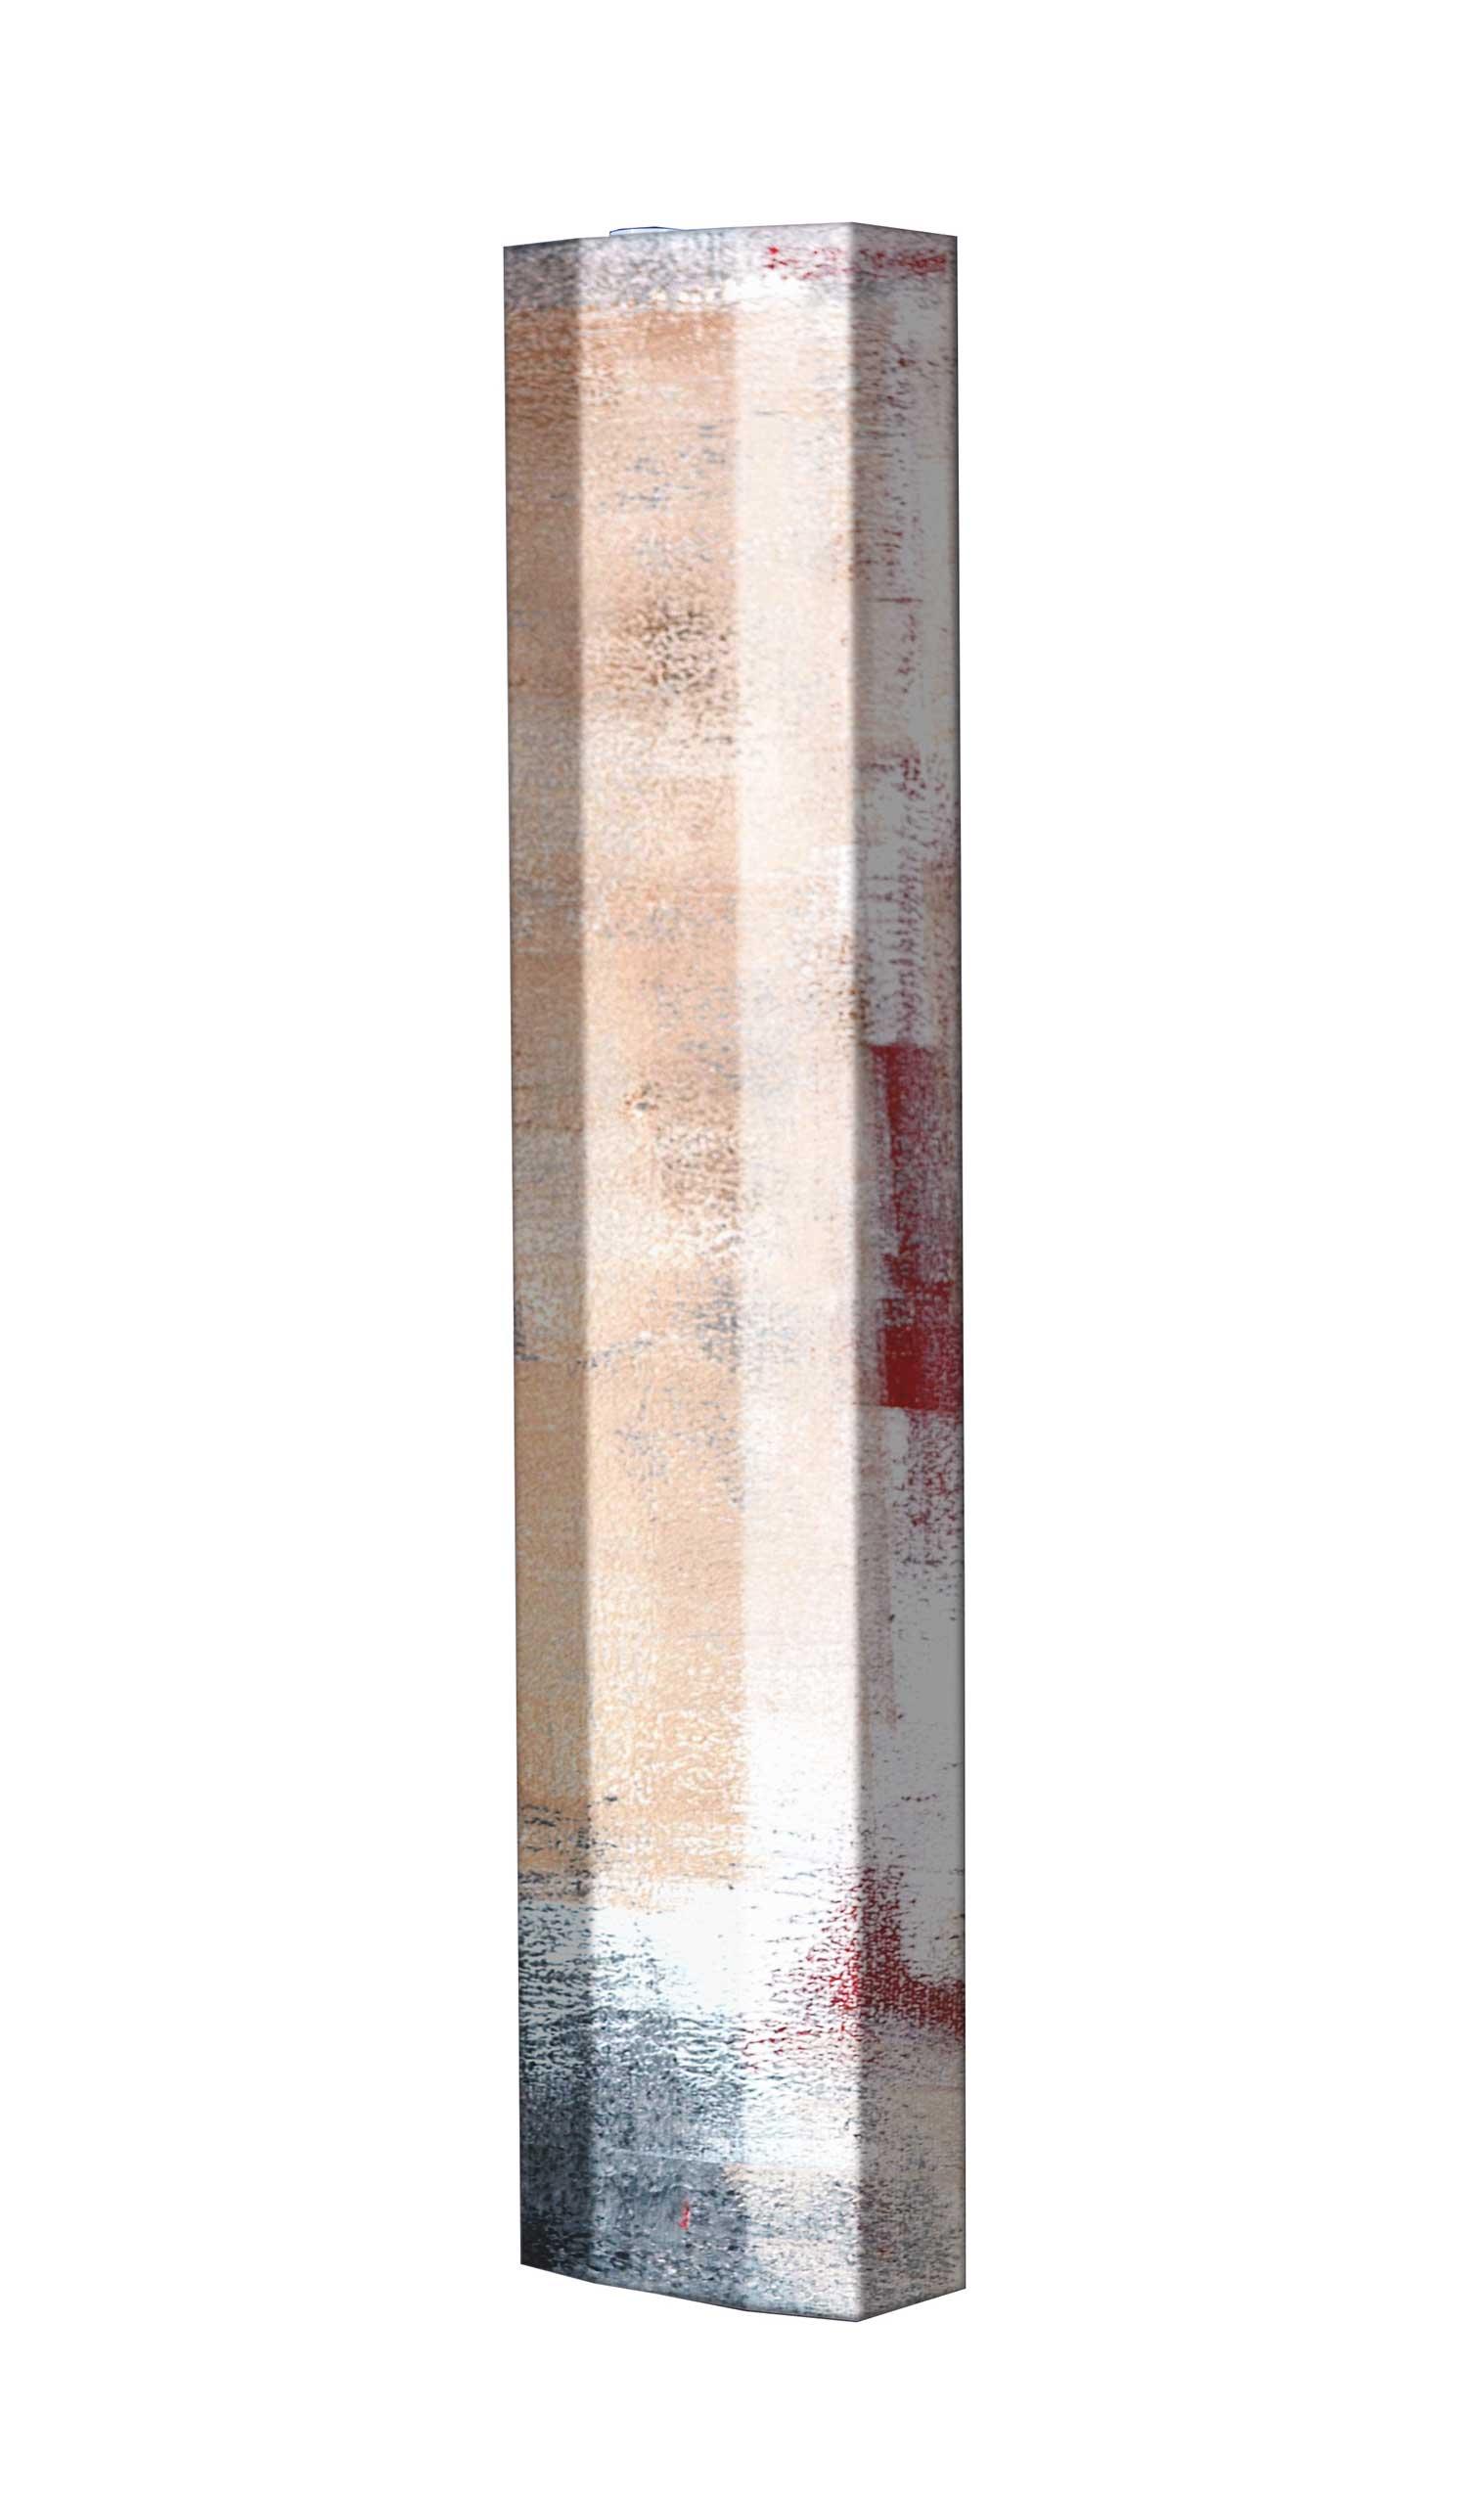 Schuhschrank STORM Motivschrank Single S139 Abstrakt weiß